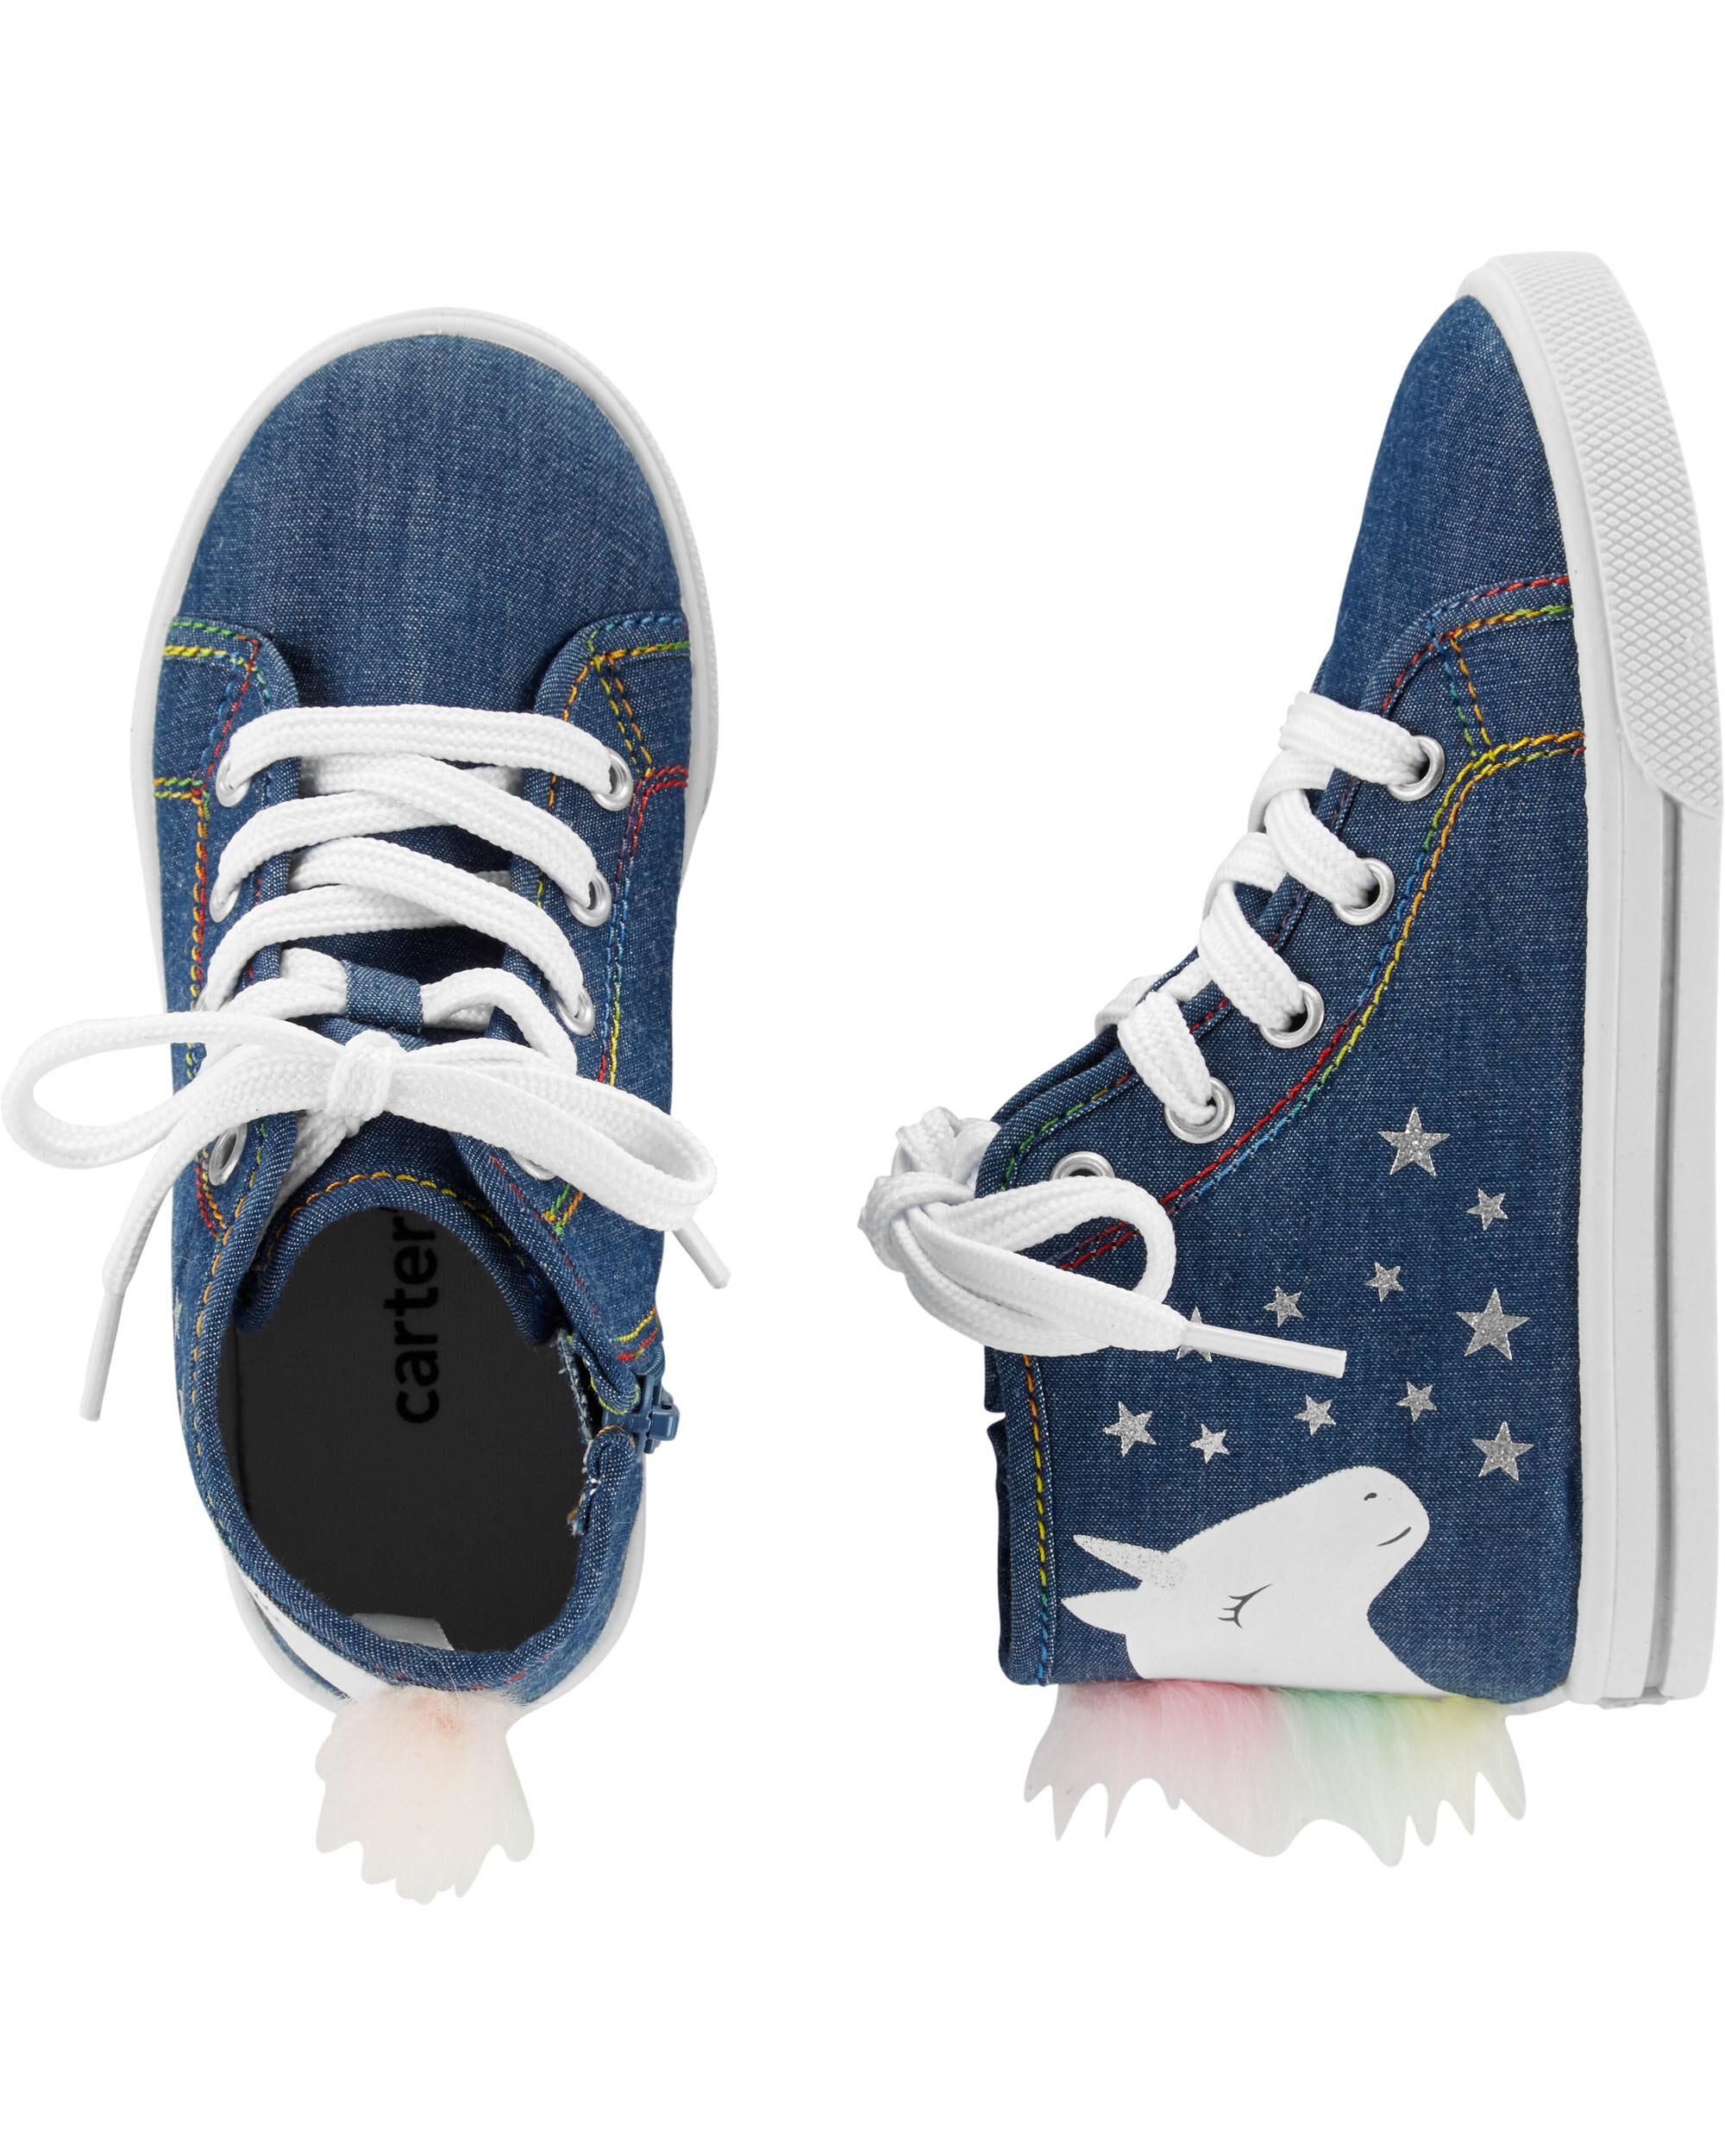 Unicorn High Top Sneakers | carters